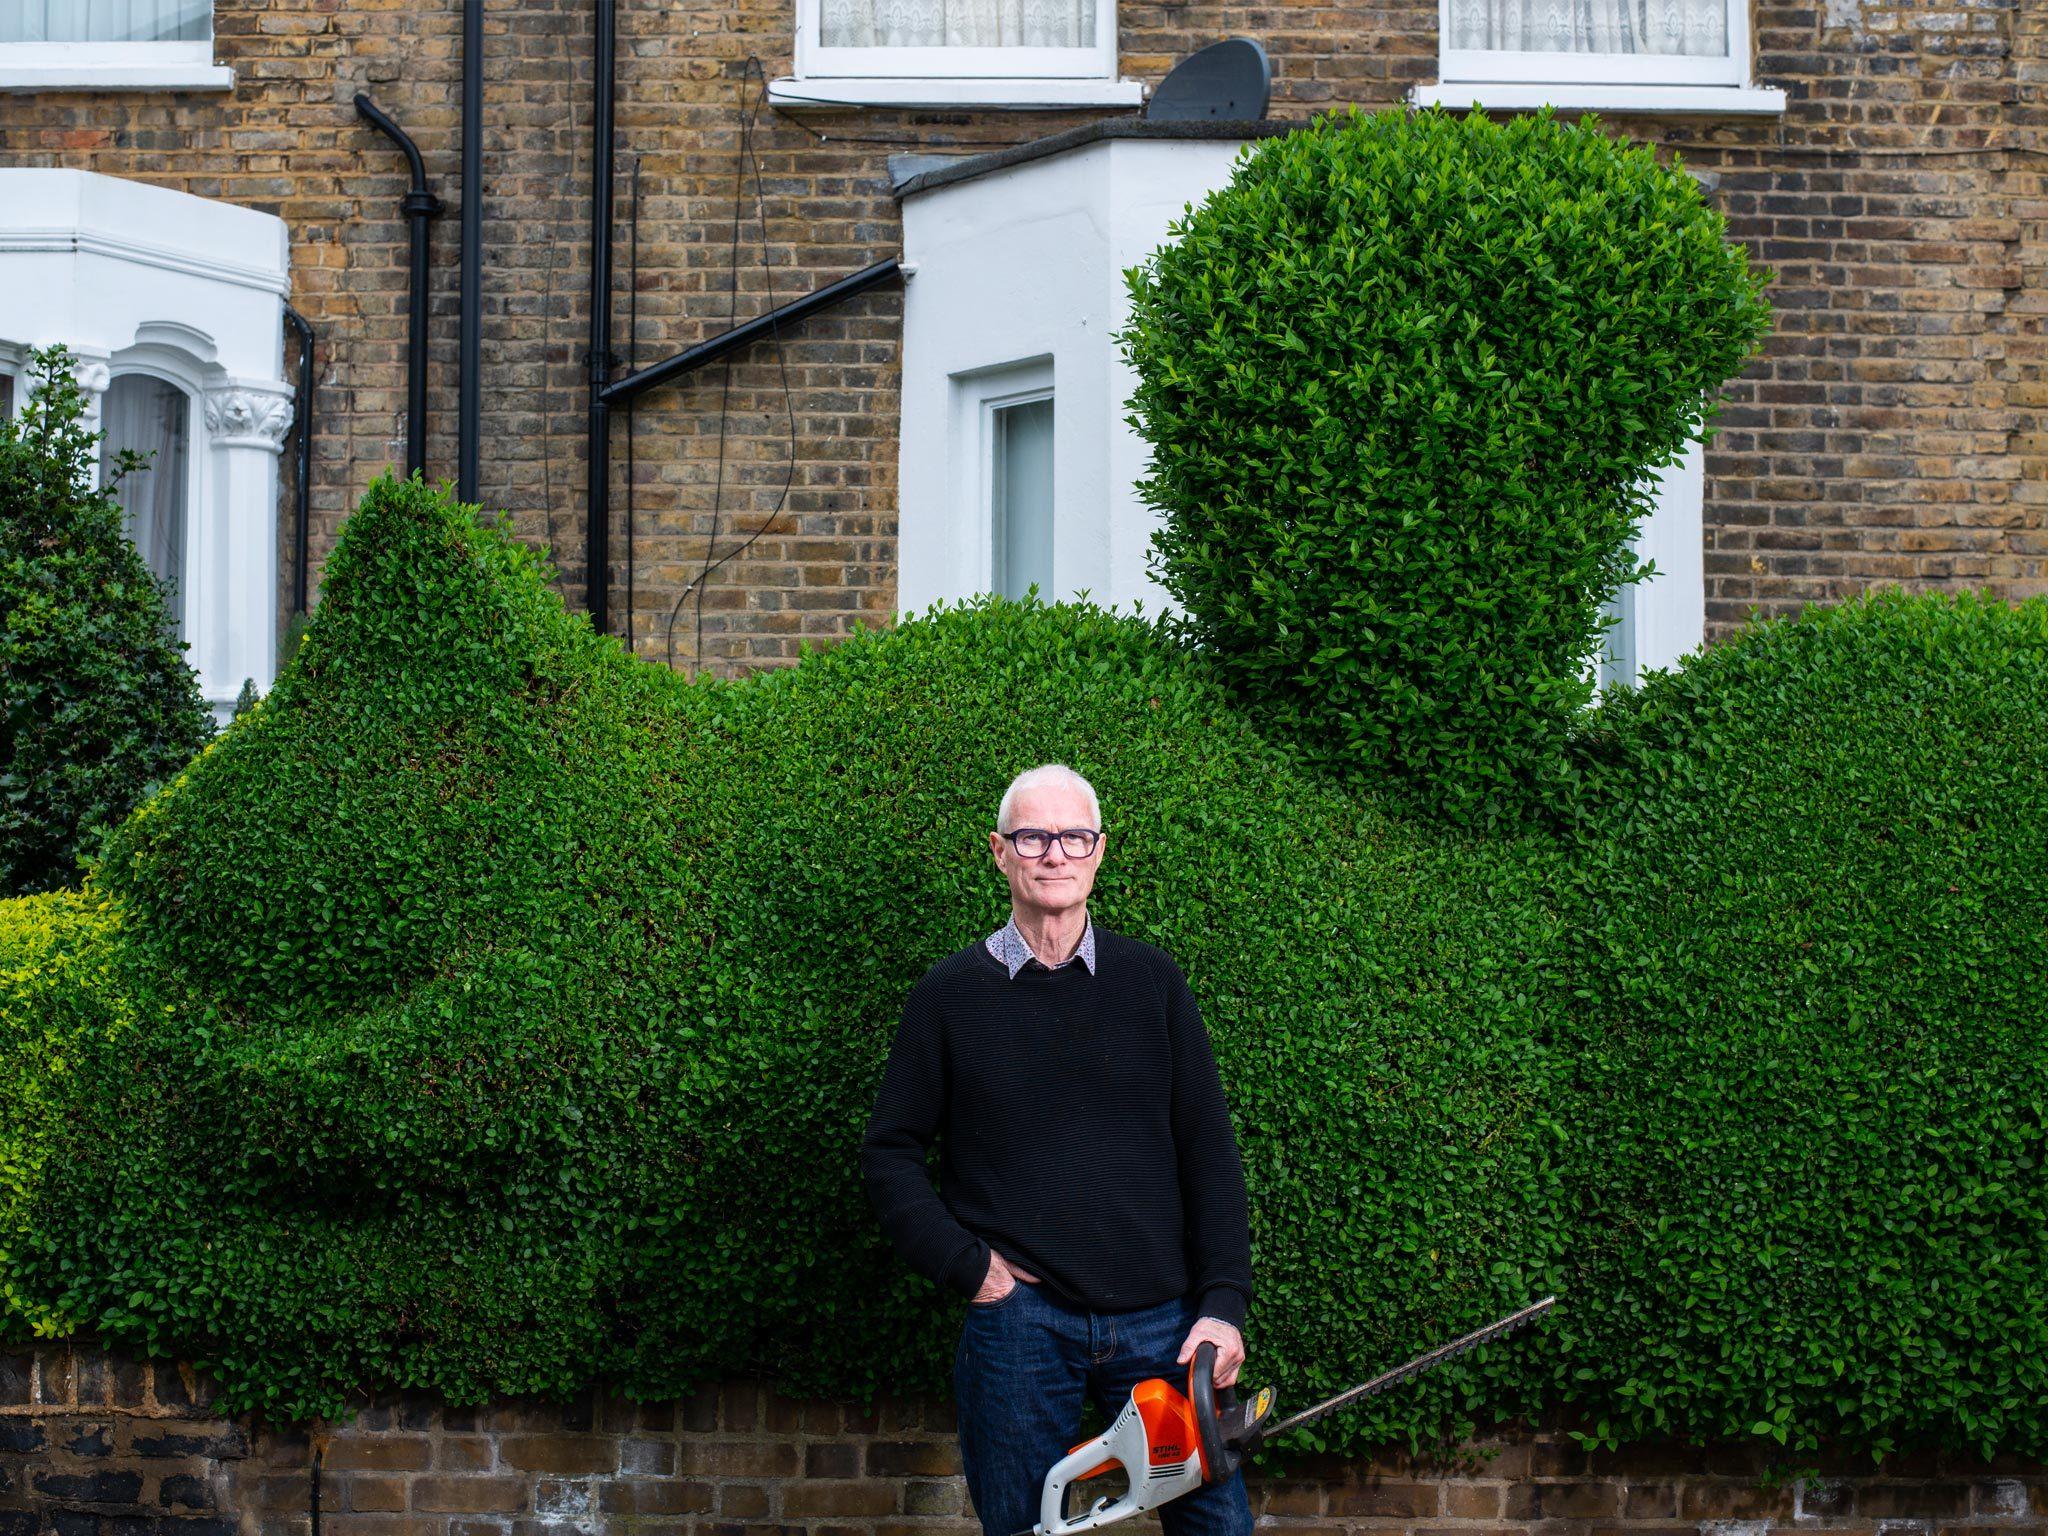 Tim Bushe, aka Hedgecutter Man